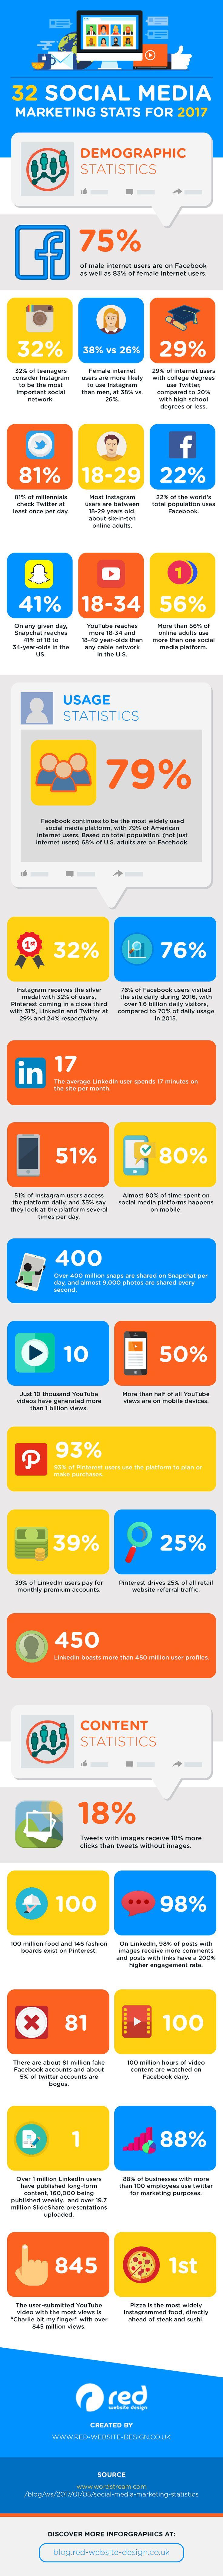 32 interessante feiten en cijfers over social media [infographic] 32-interessante-social-mediamarketing-feiten-en-cijfers-op-een-rij-.jpg (900×10403)